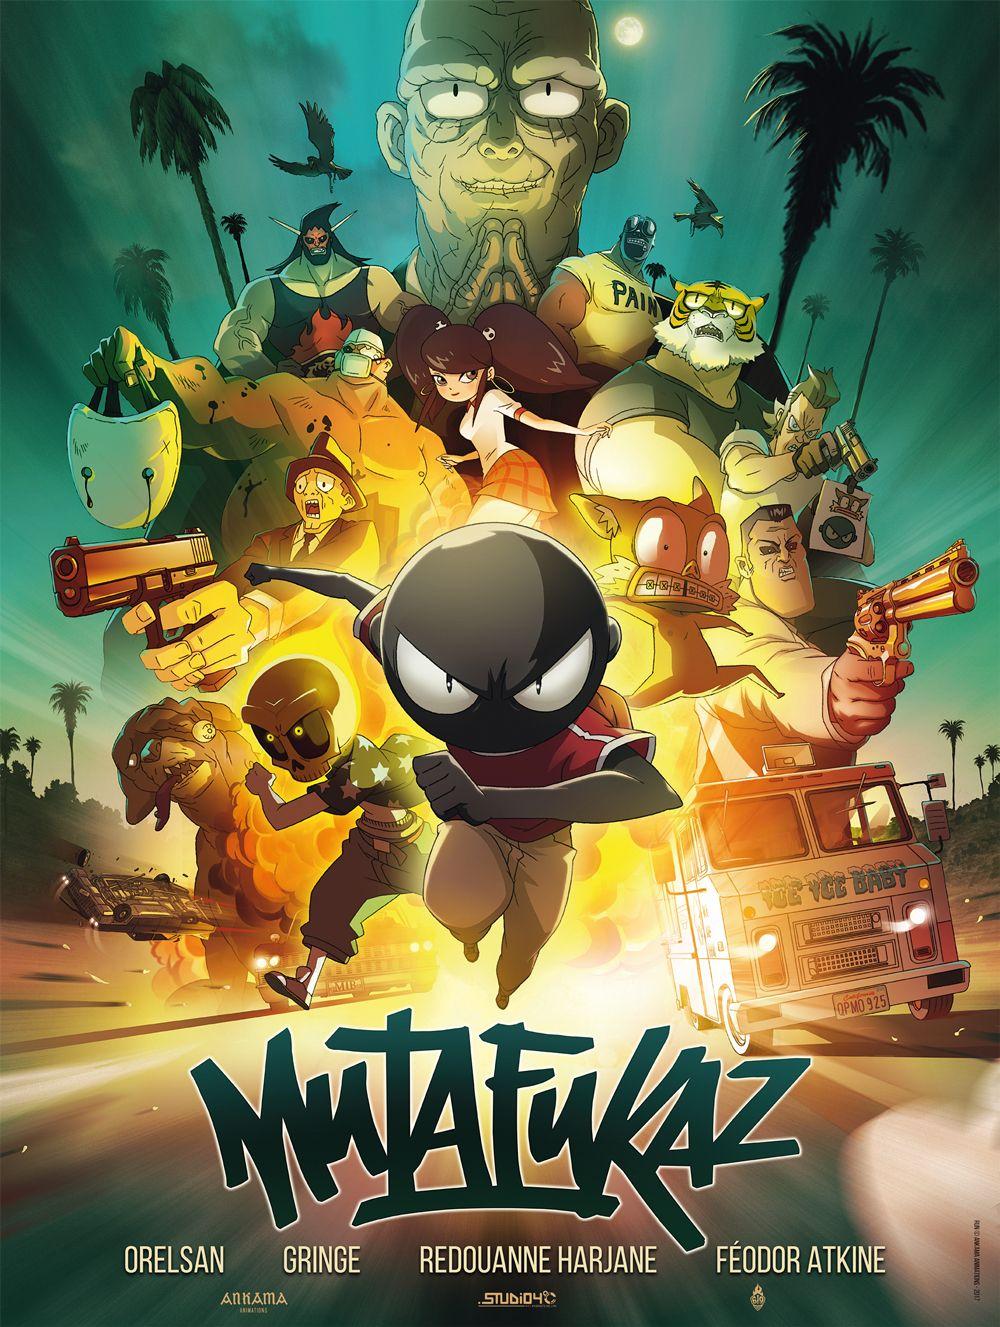 Mutafukaz (2018) HD Wallpaper From Movies